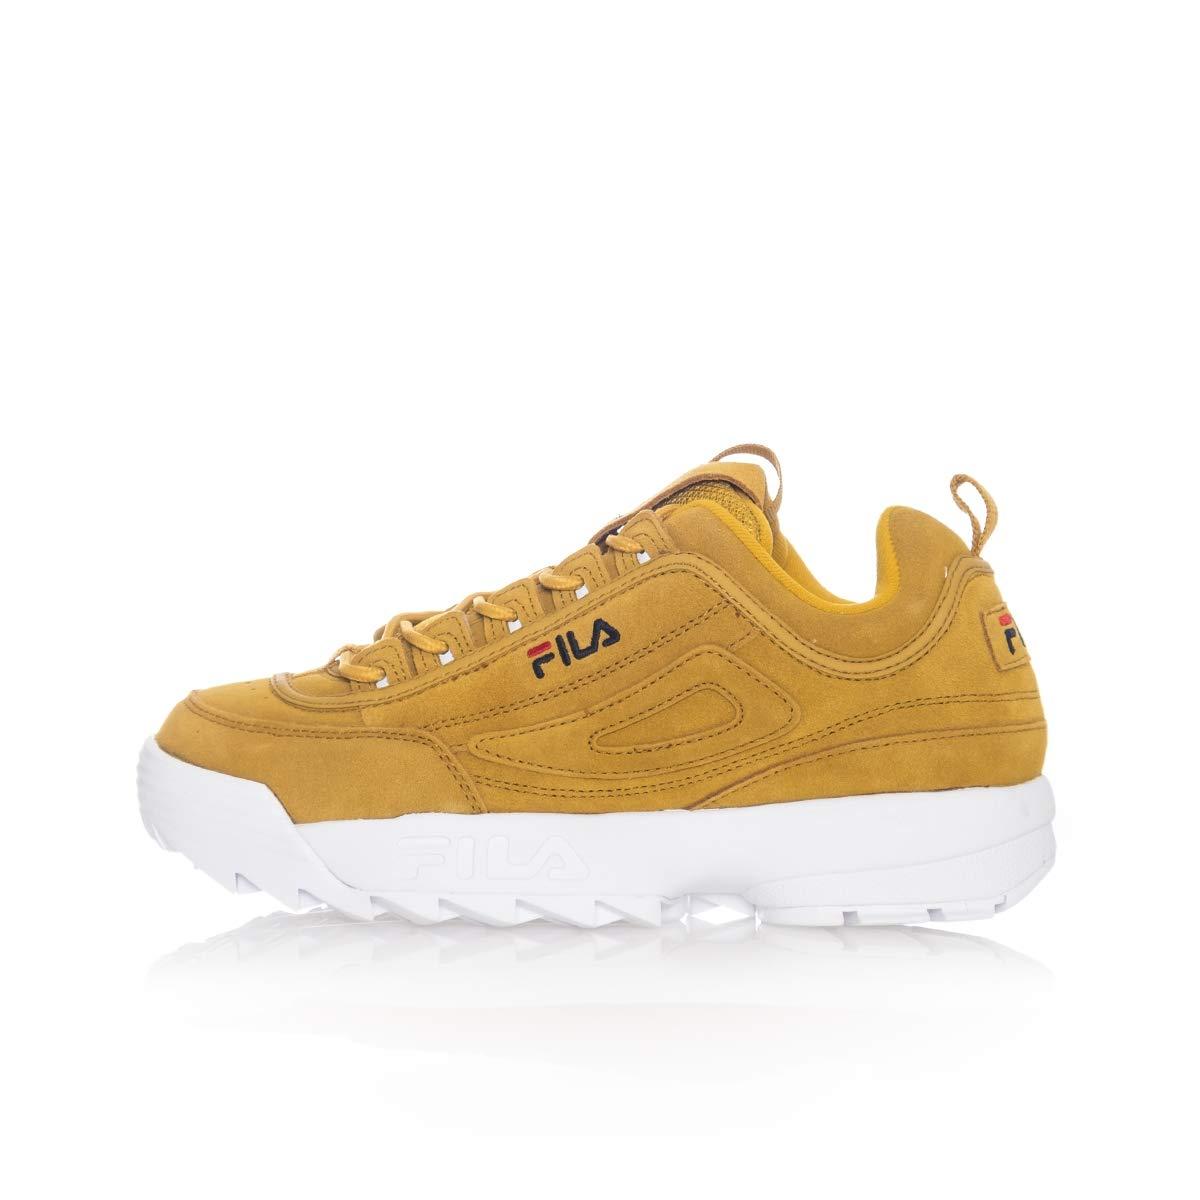 Fila Sneakers Uomo Disruptor S Low 1010577.60I